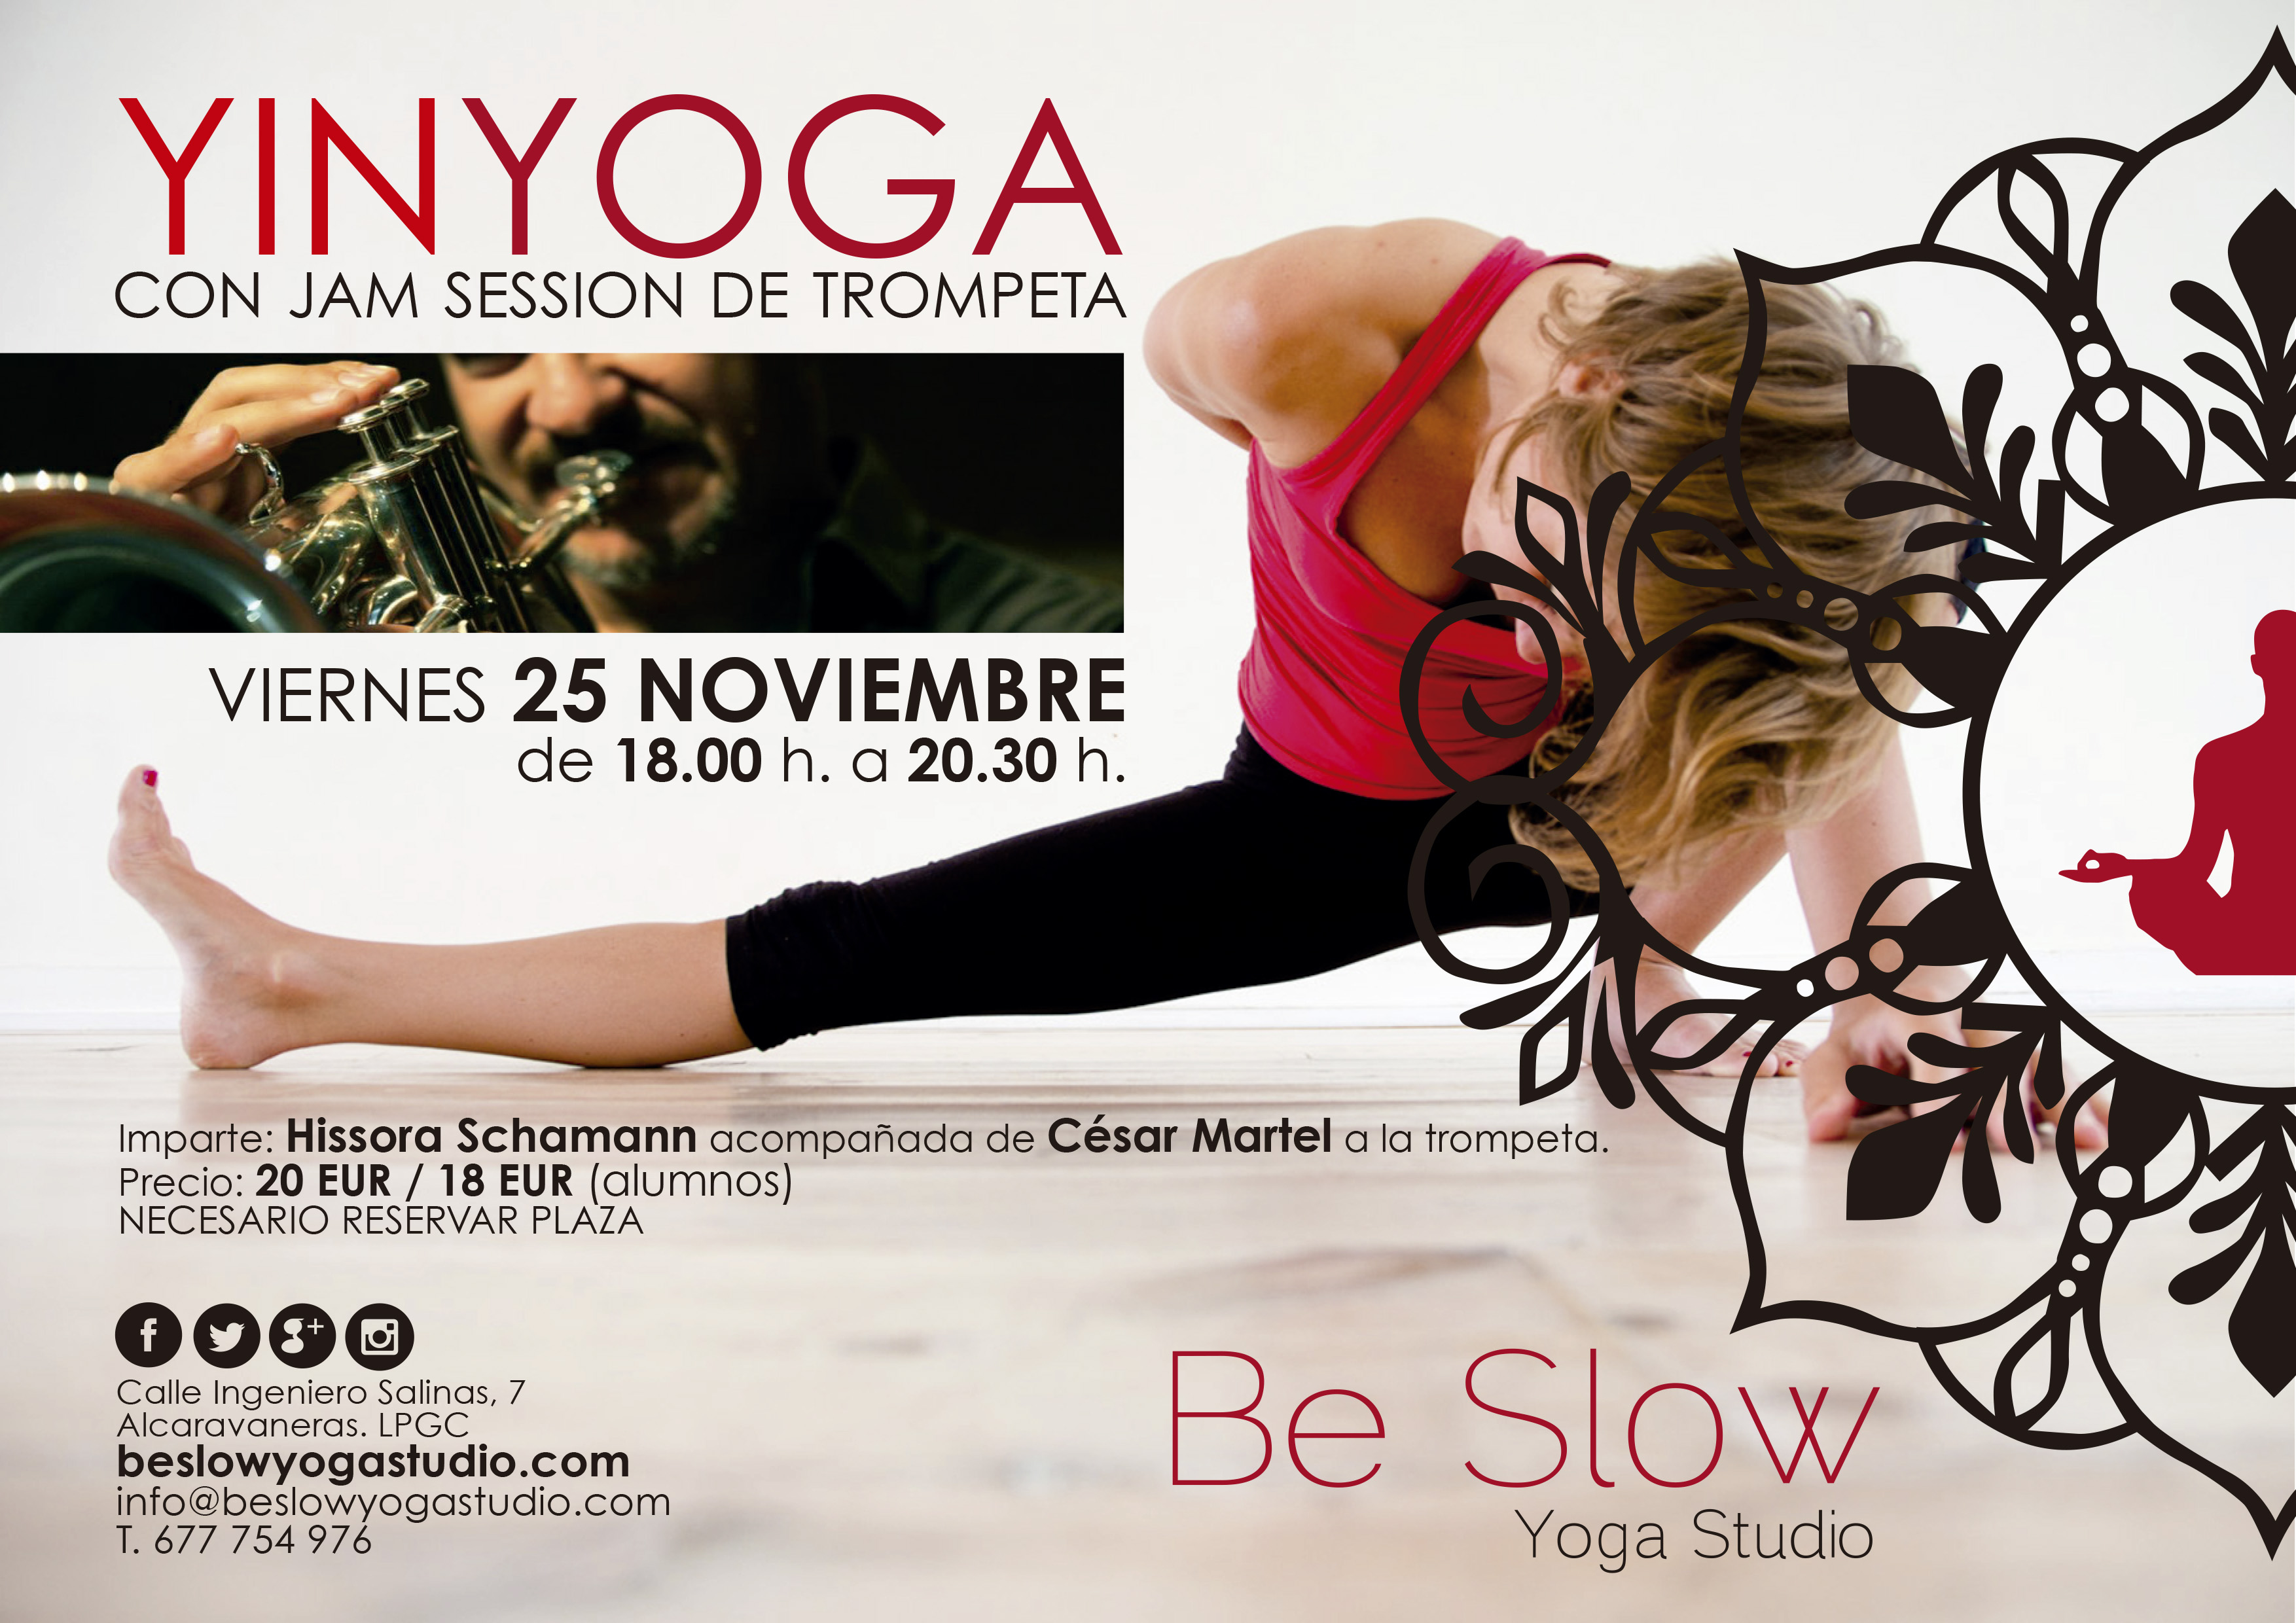 Yin Yoga con Jam Session para este viernes 25 NOV